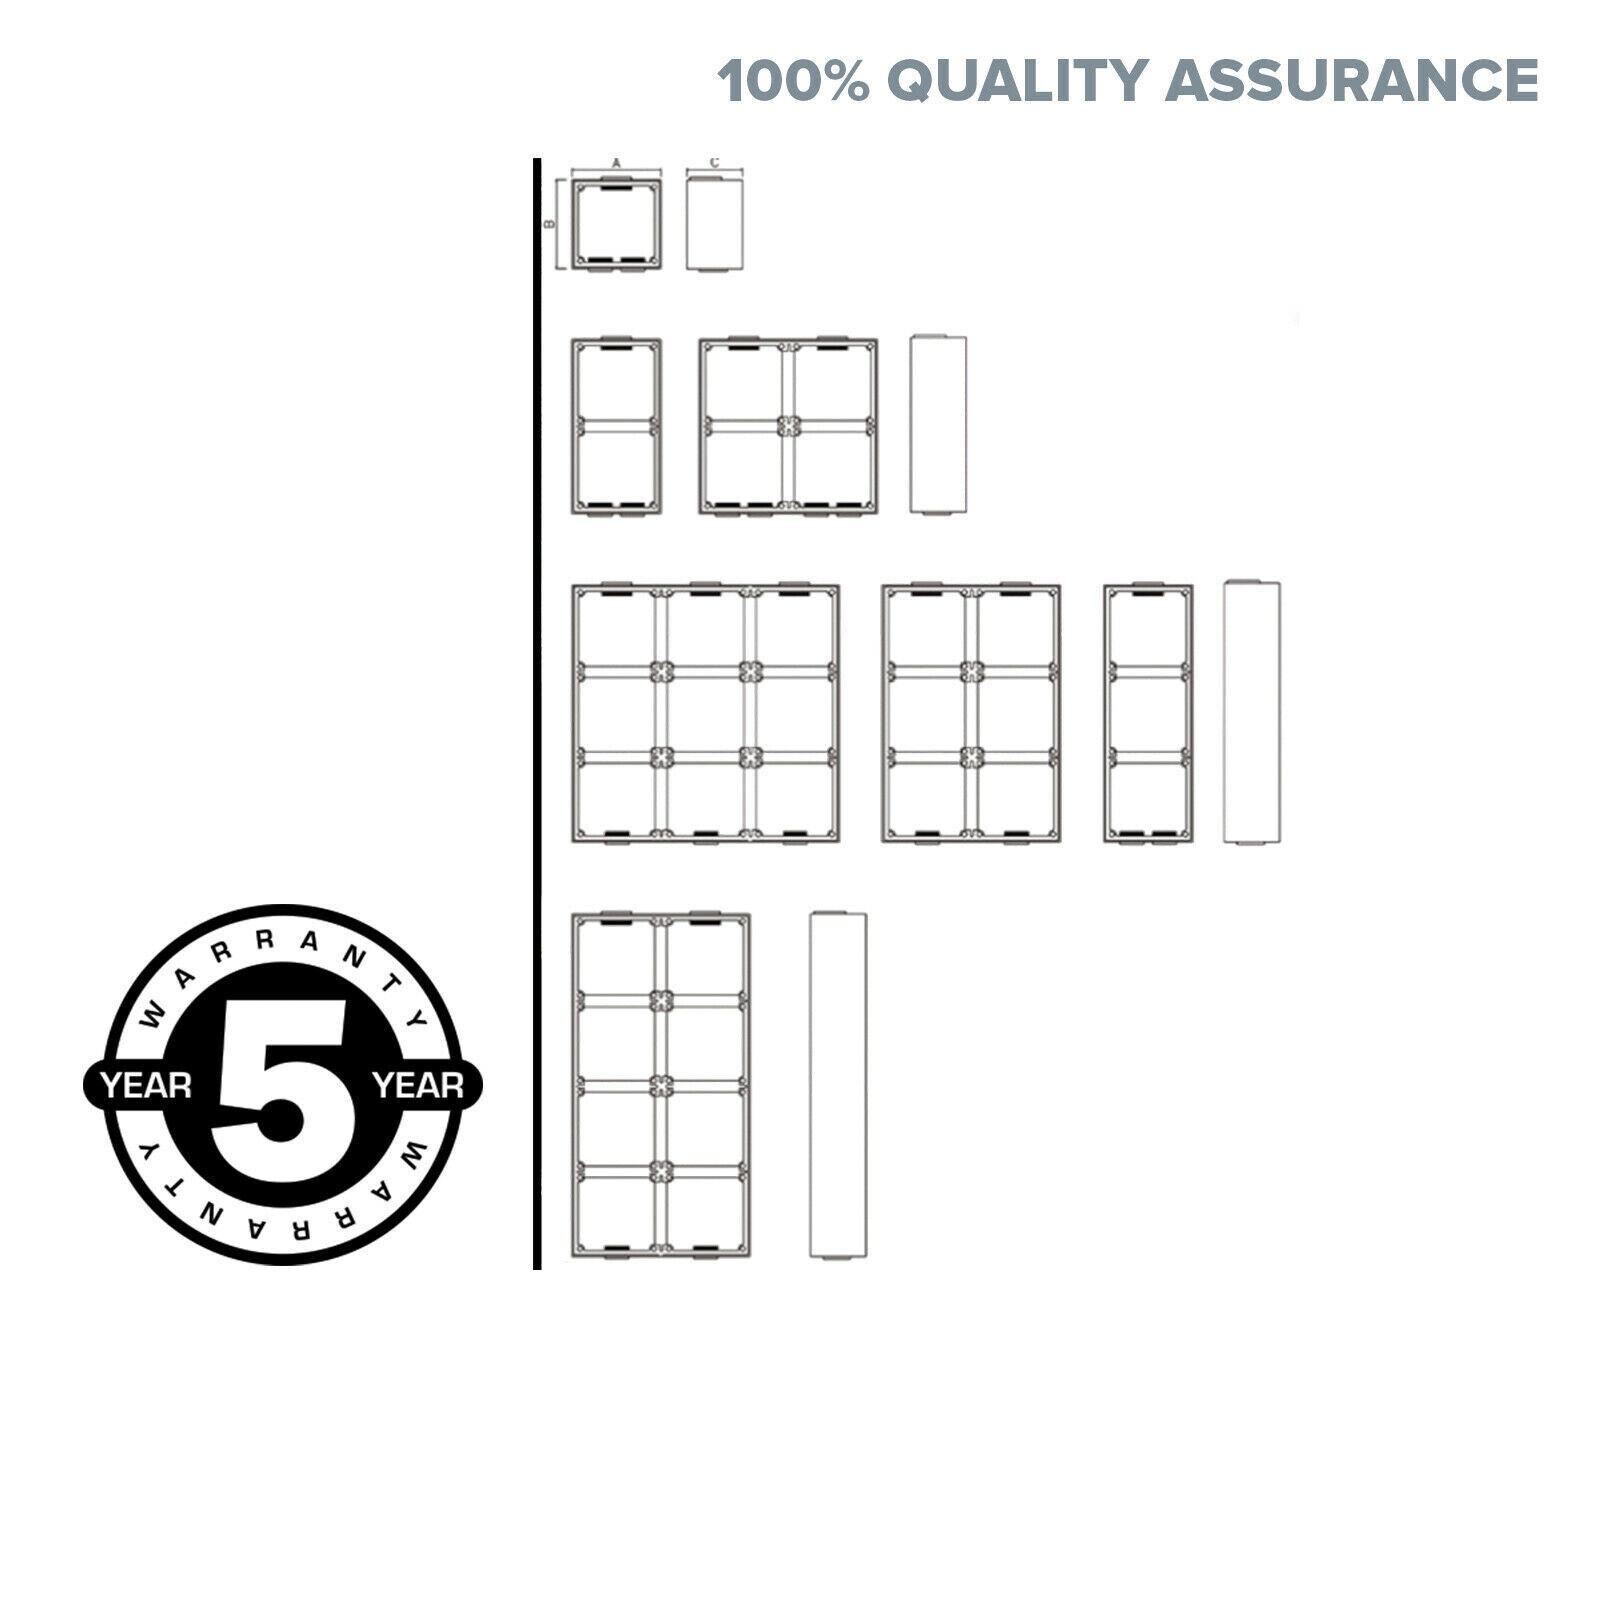 6 Six Way Mounting Block Enclosure Box Switches Conduit